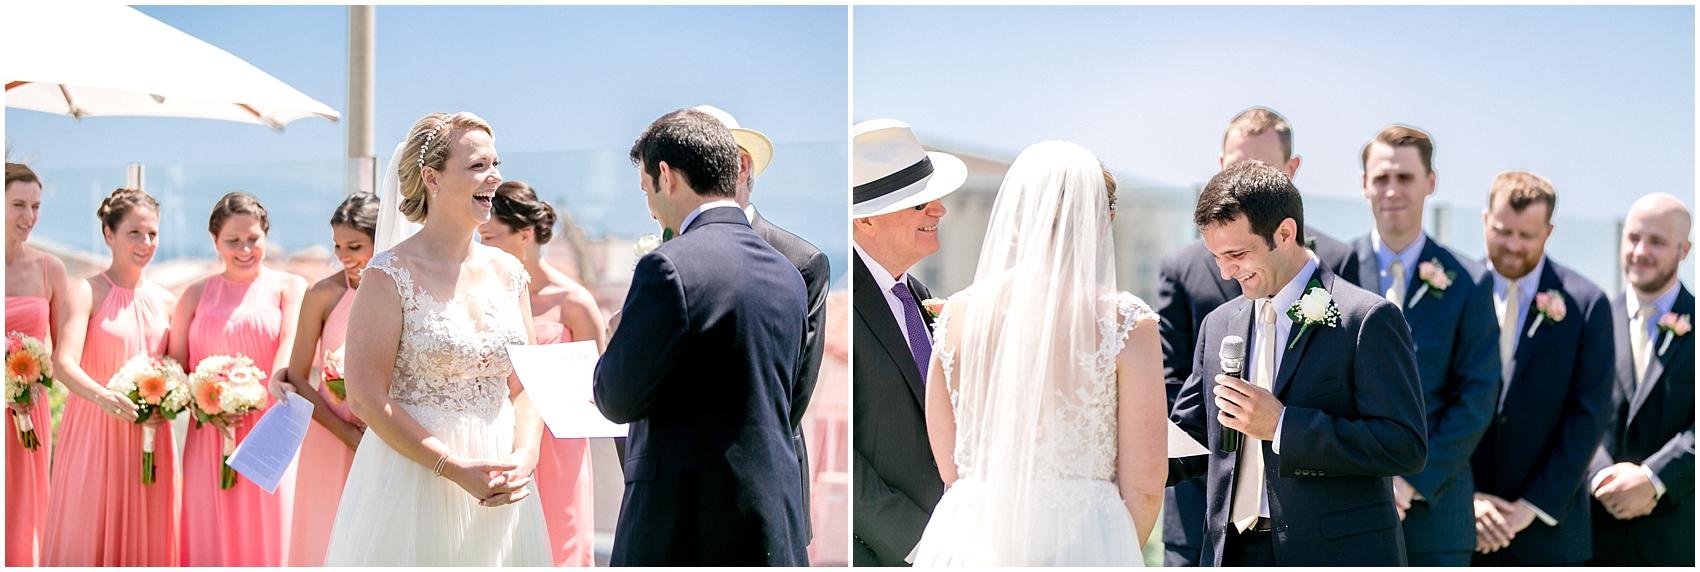 Jen and Mark's Wedding-0414.jpg